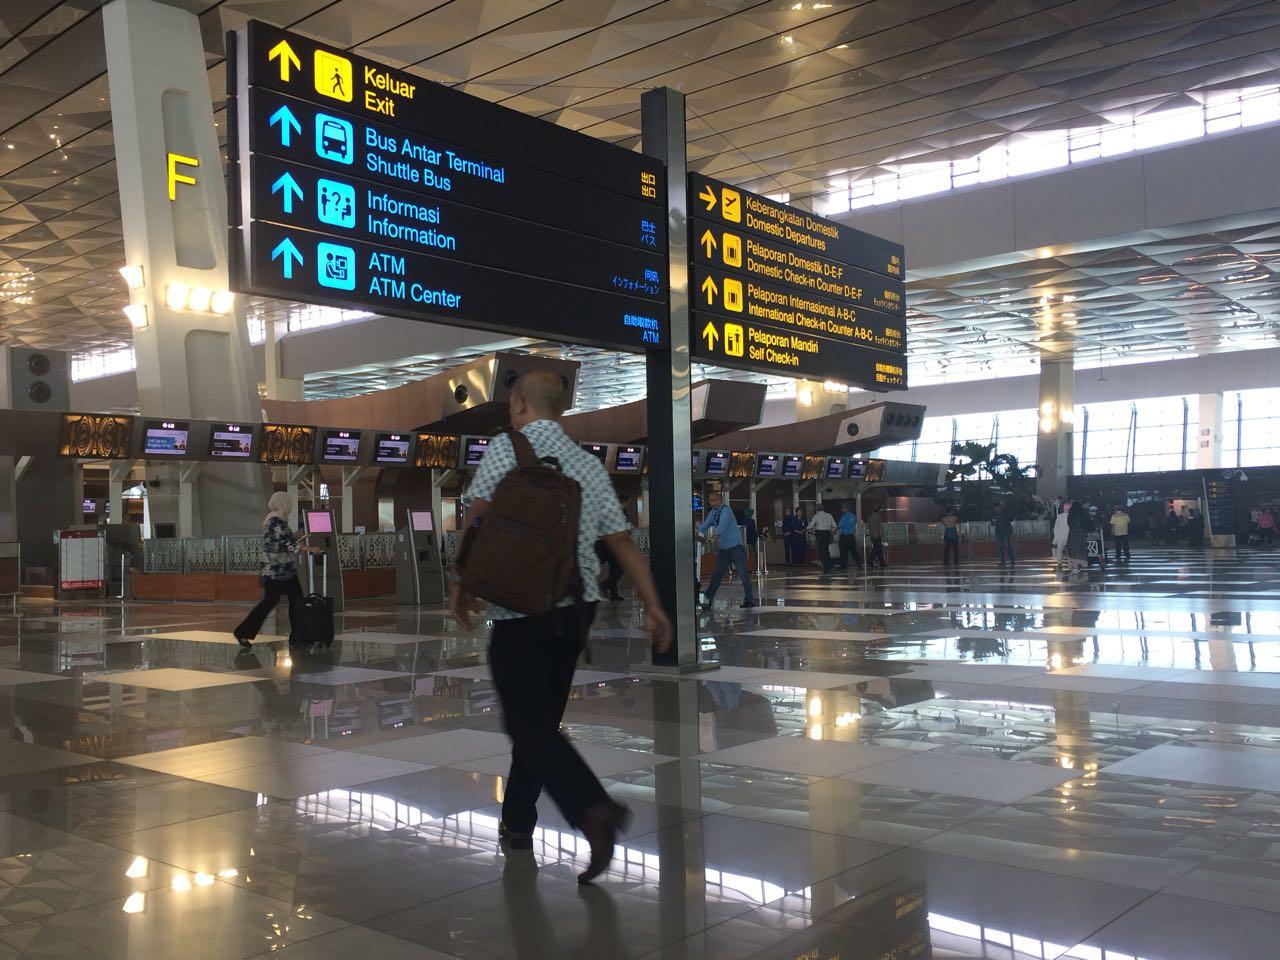 https: img-z.okeinfo.net content 2020 01 24 320 2157980 ap-i-pede-pembangunan-bandara-internasional-yogyakarta-tepat-waktu-MzDKD7W2wU.jpg